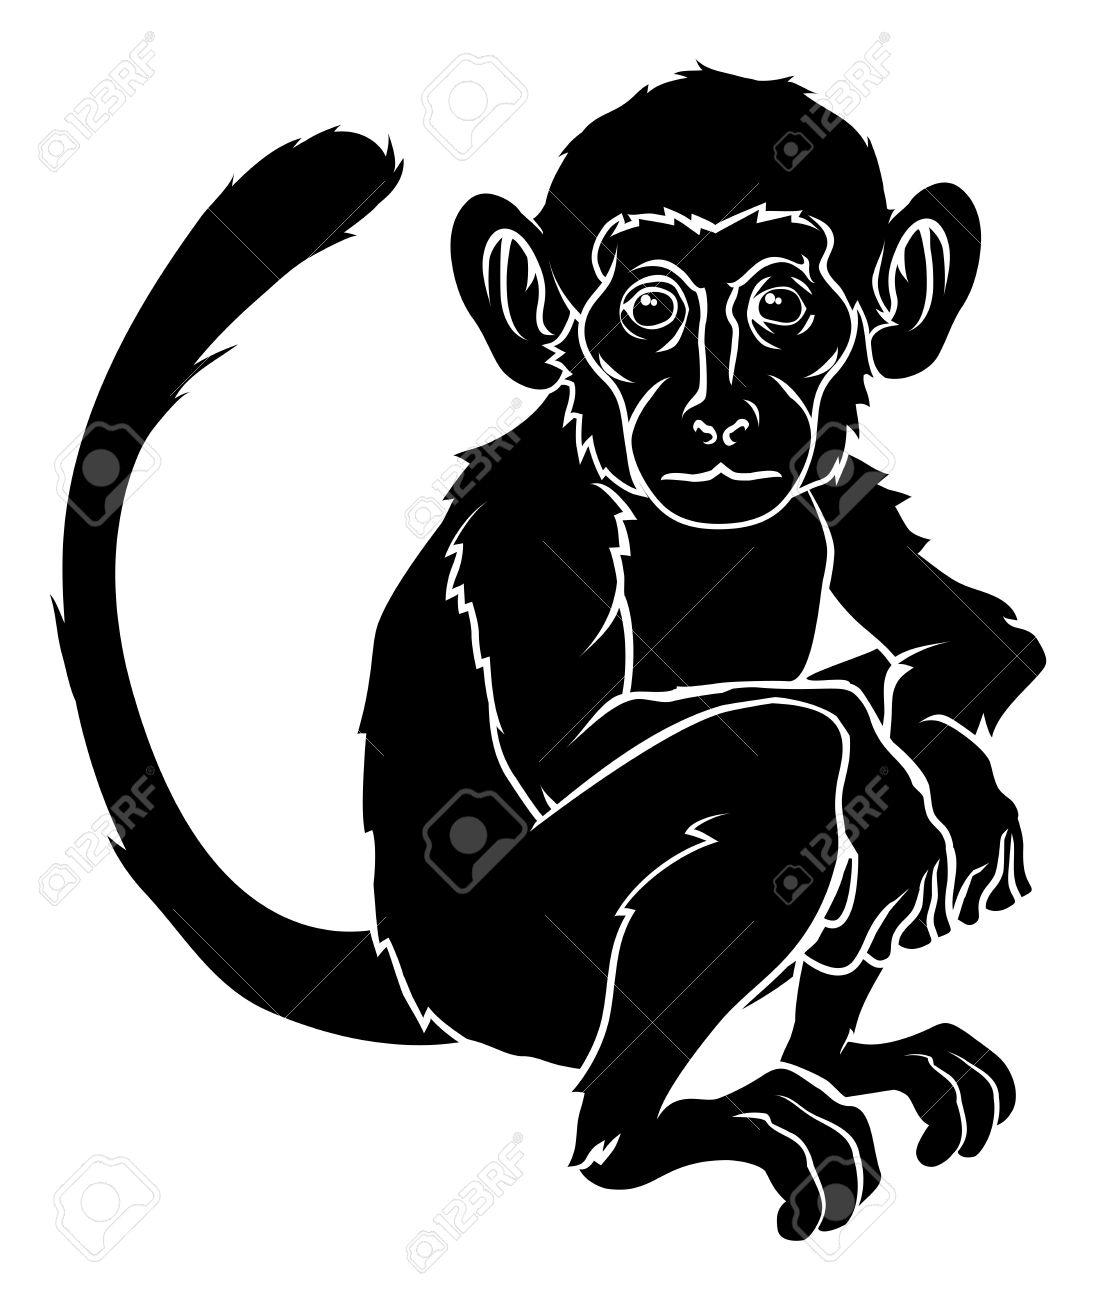 black silhouette monkey tattoo design. Black Bedroom Furniture Sets. Home Design Ideas